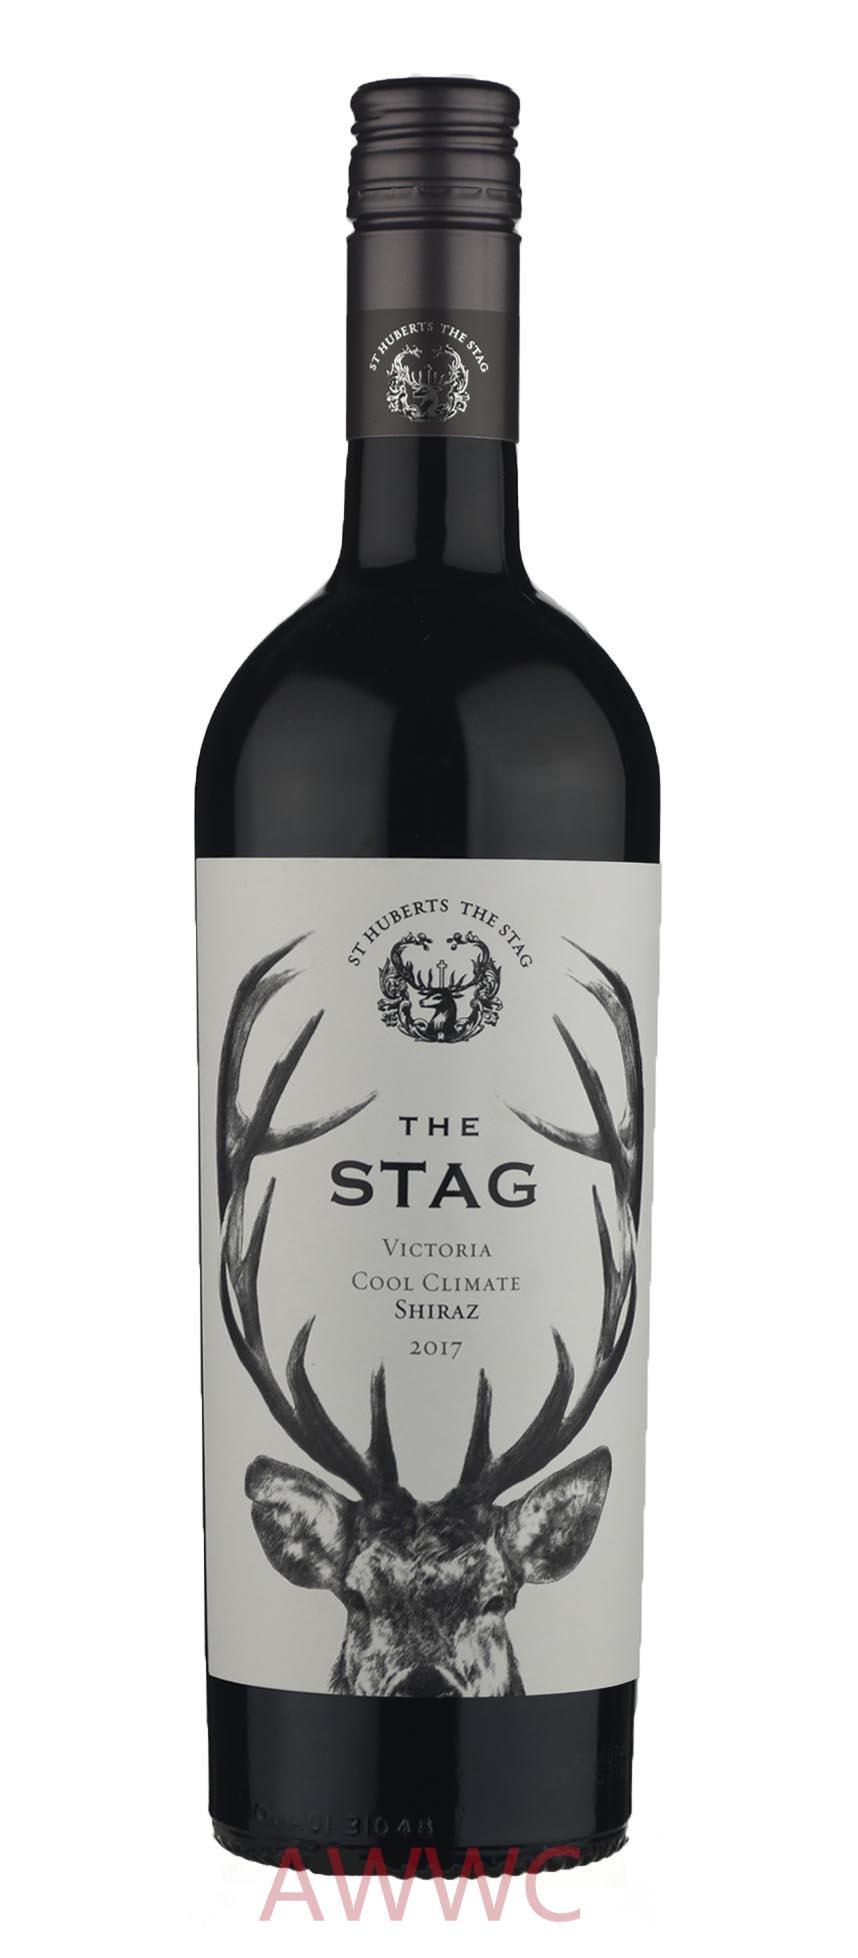 聖休伯特 the stag 設拉子 2017